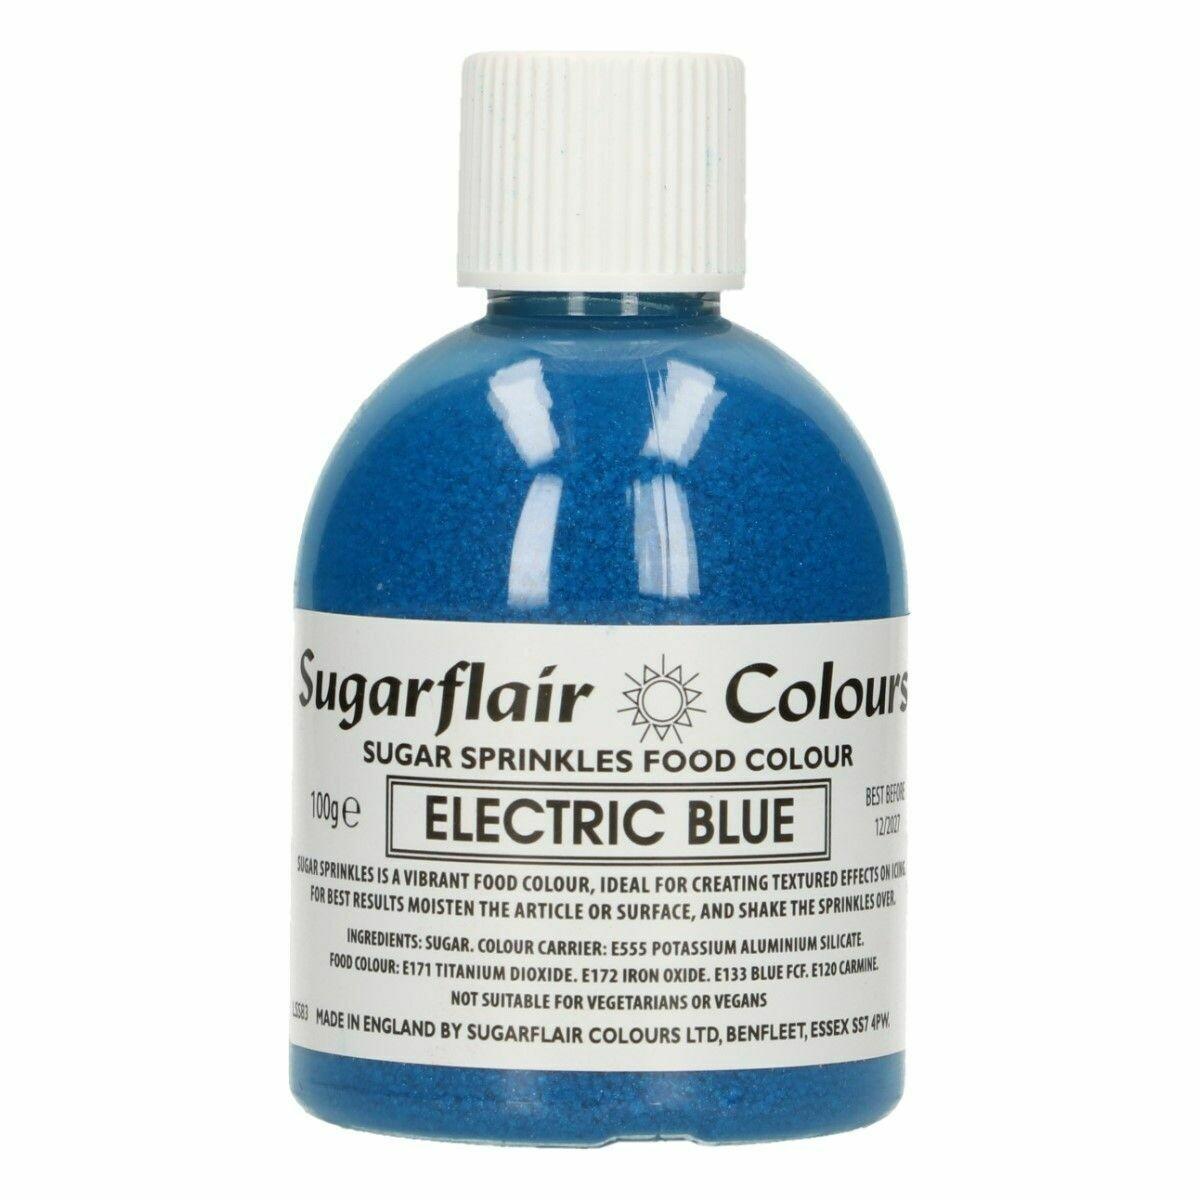 Sugarflair -Sparkling Sugar Sprinkles -ELECTRIC BLUE 100g ΖΑΧΑΡΗ -